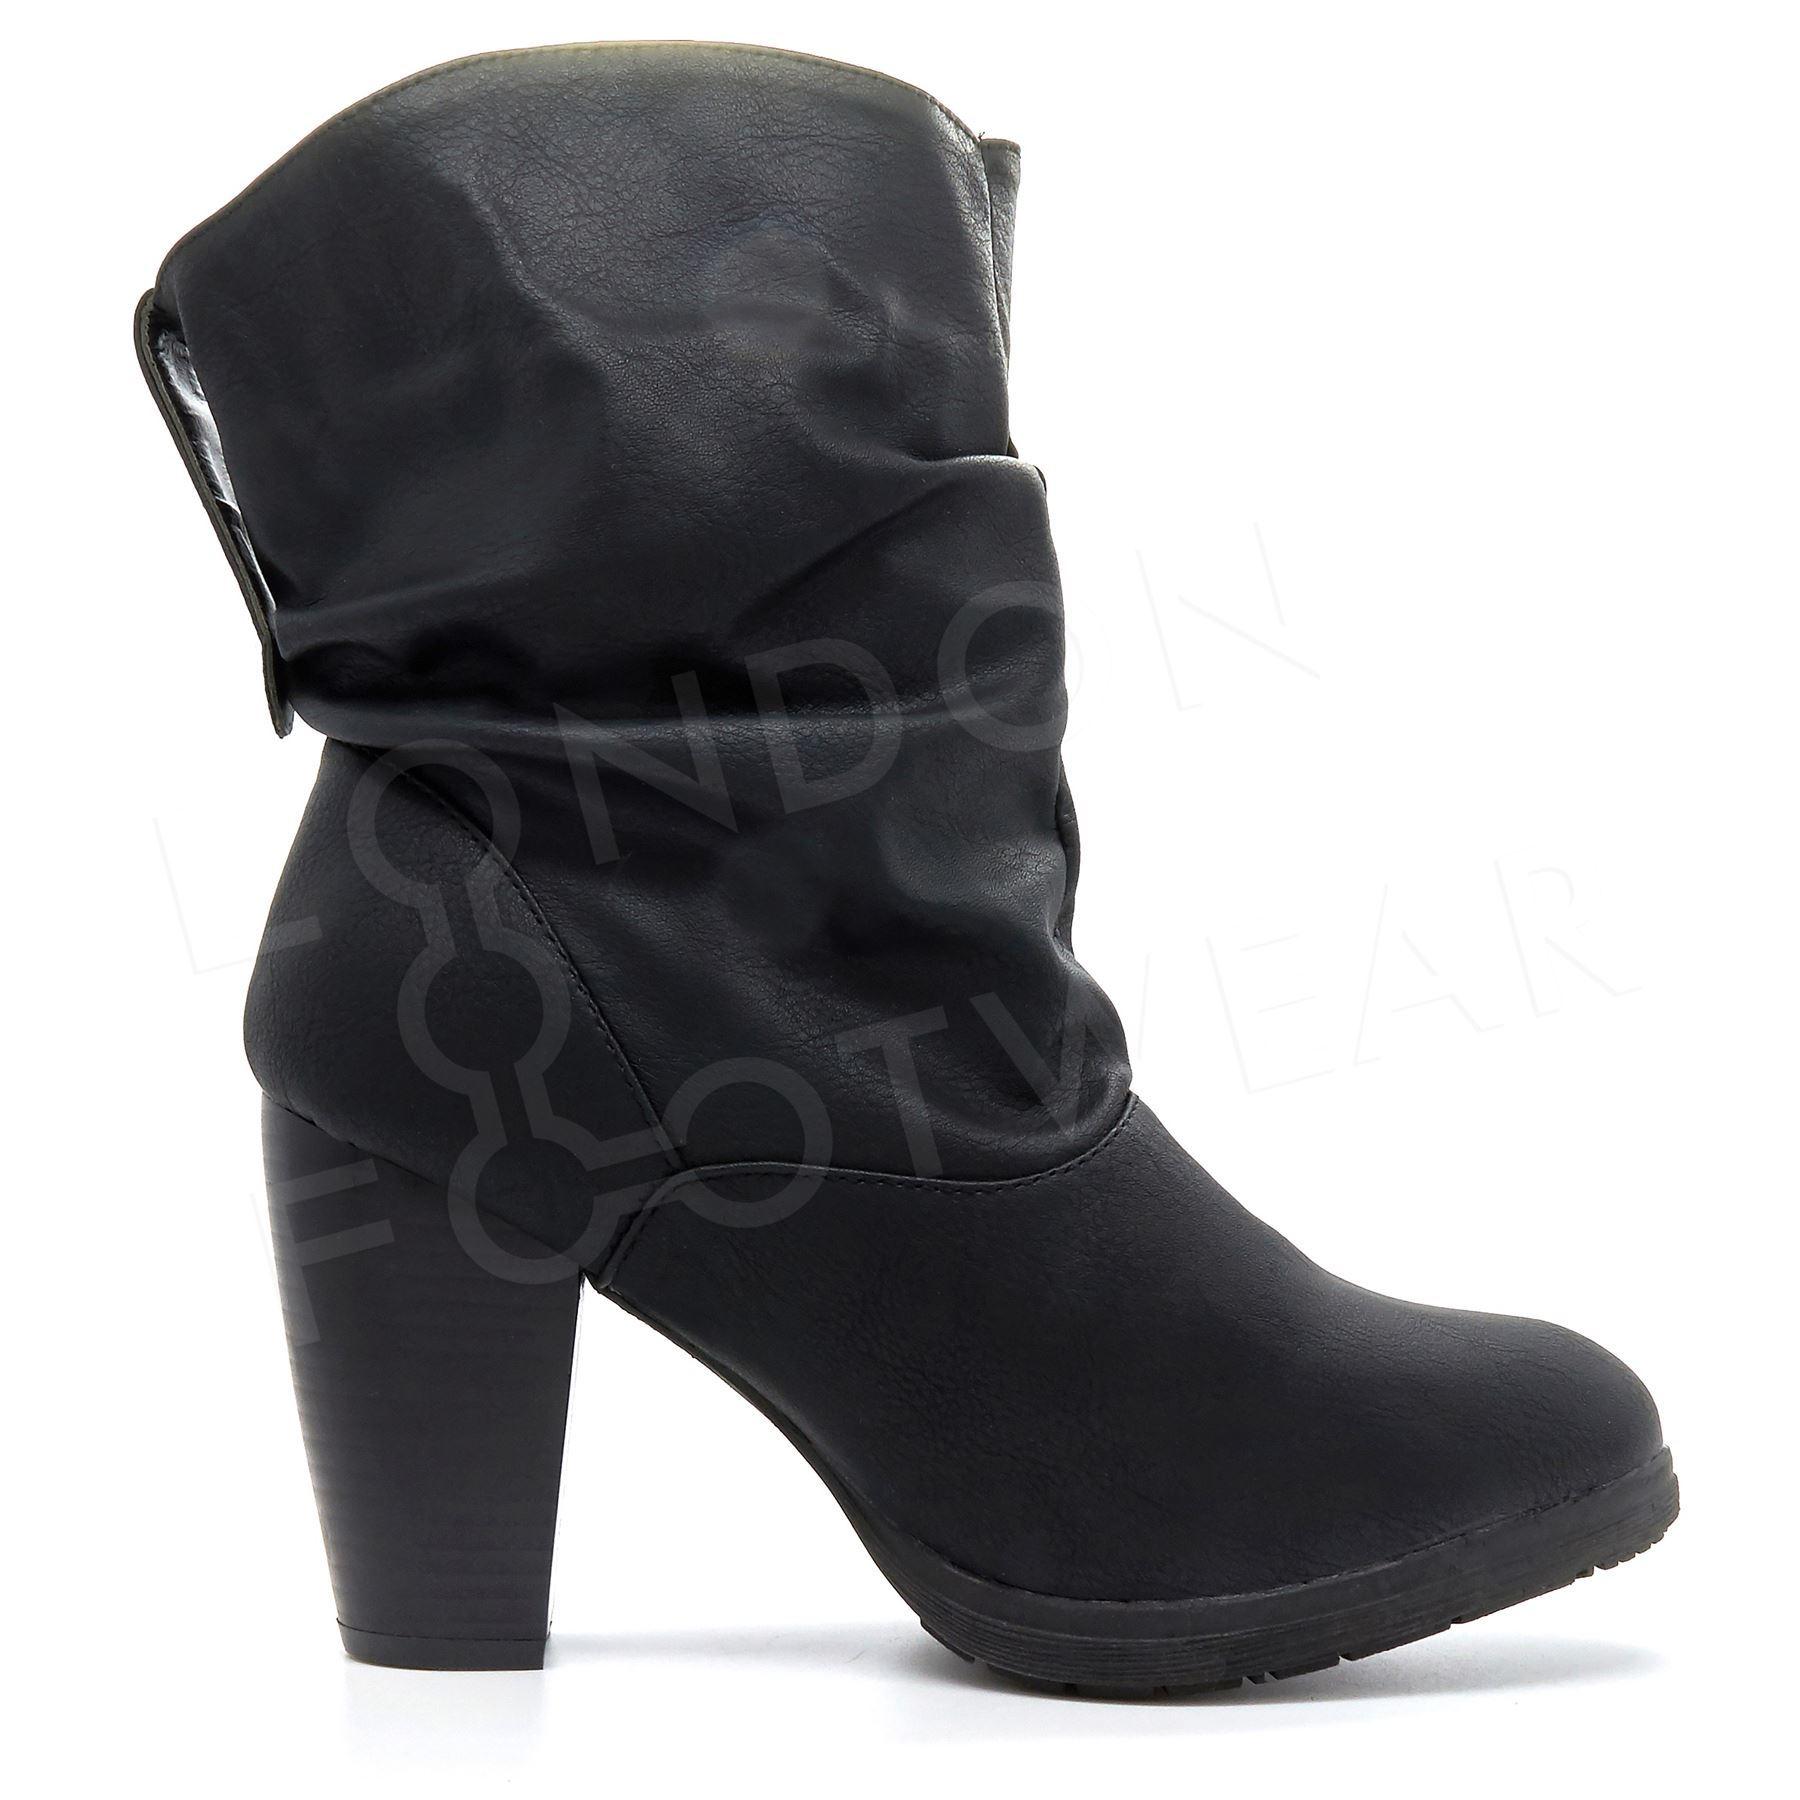 Women Classics Pull On Mid Calf Boots Shoes Mid Block Heel